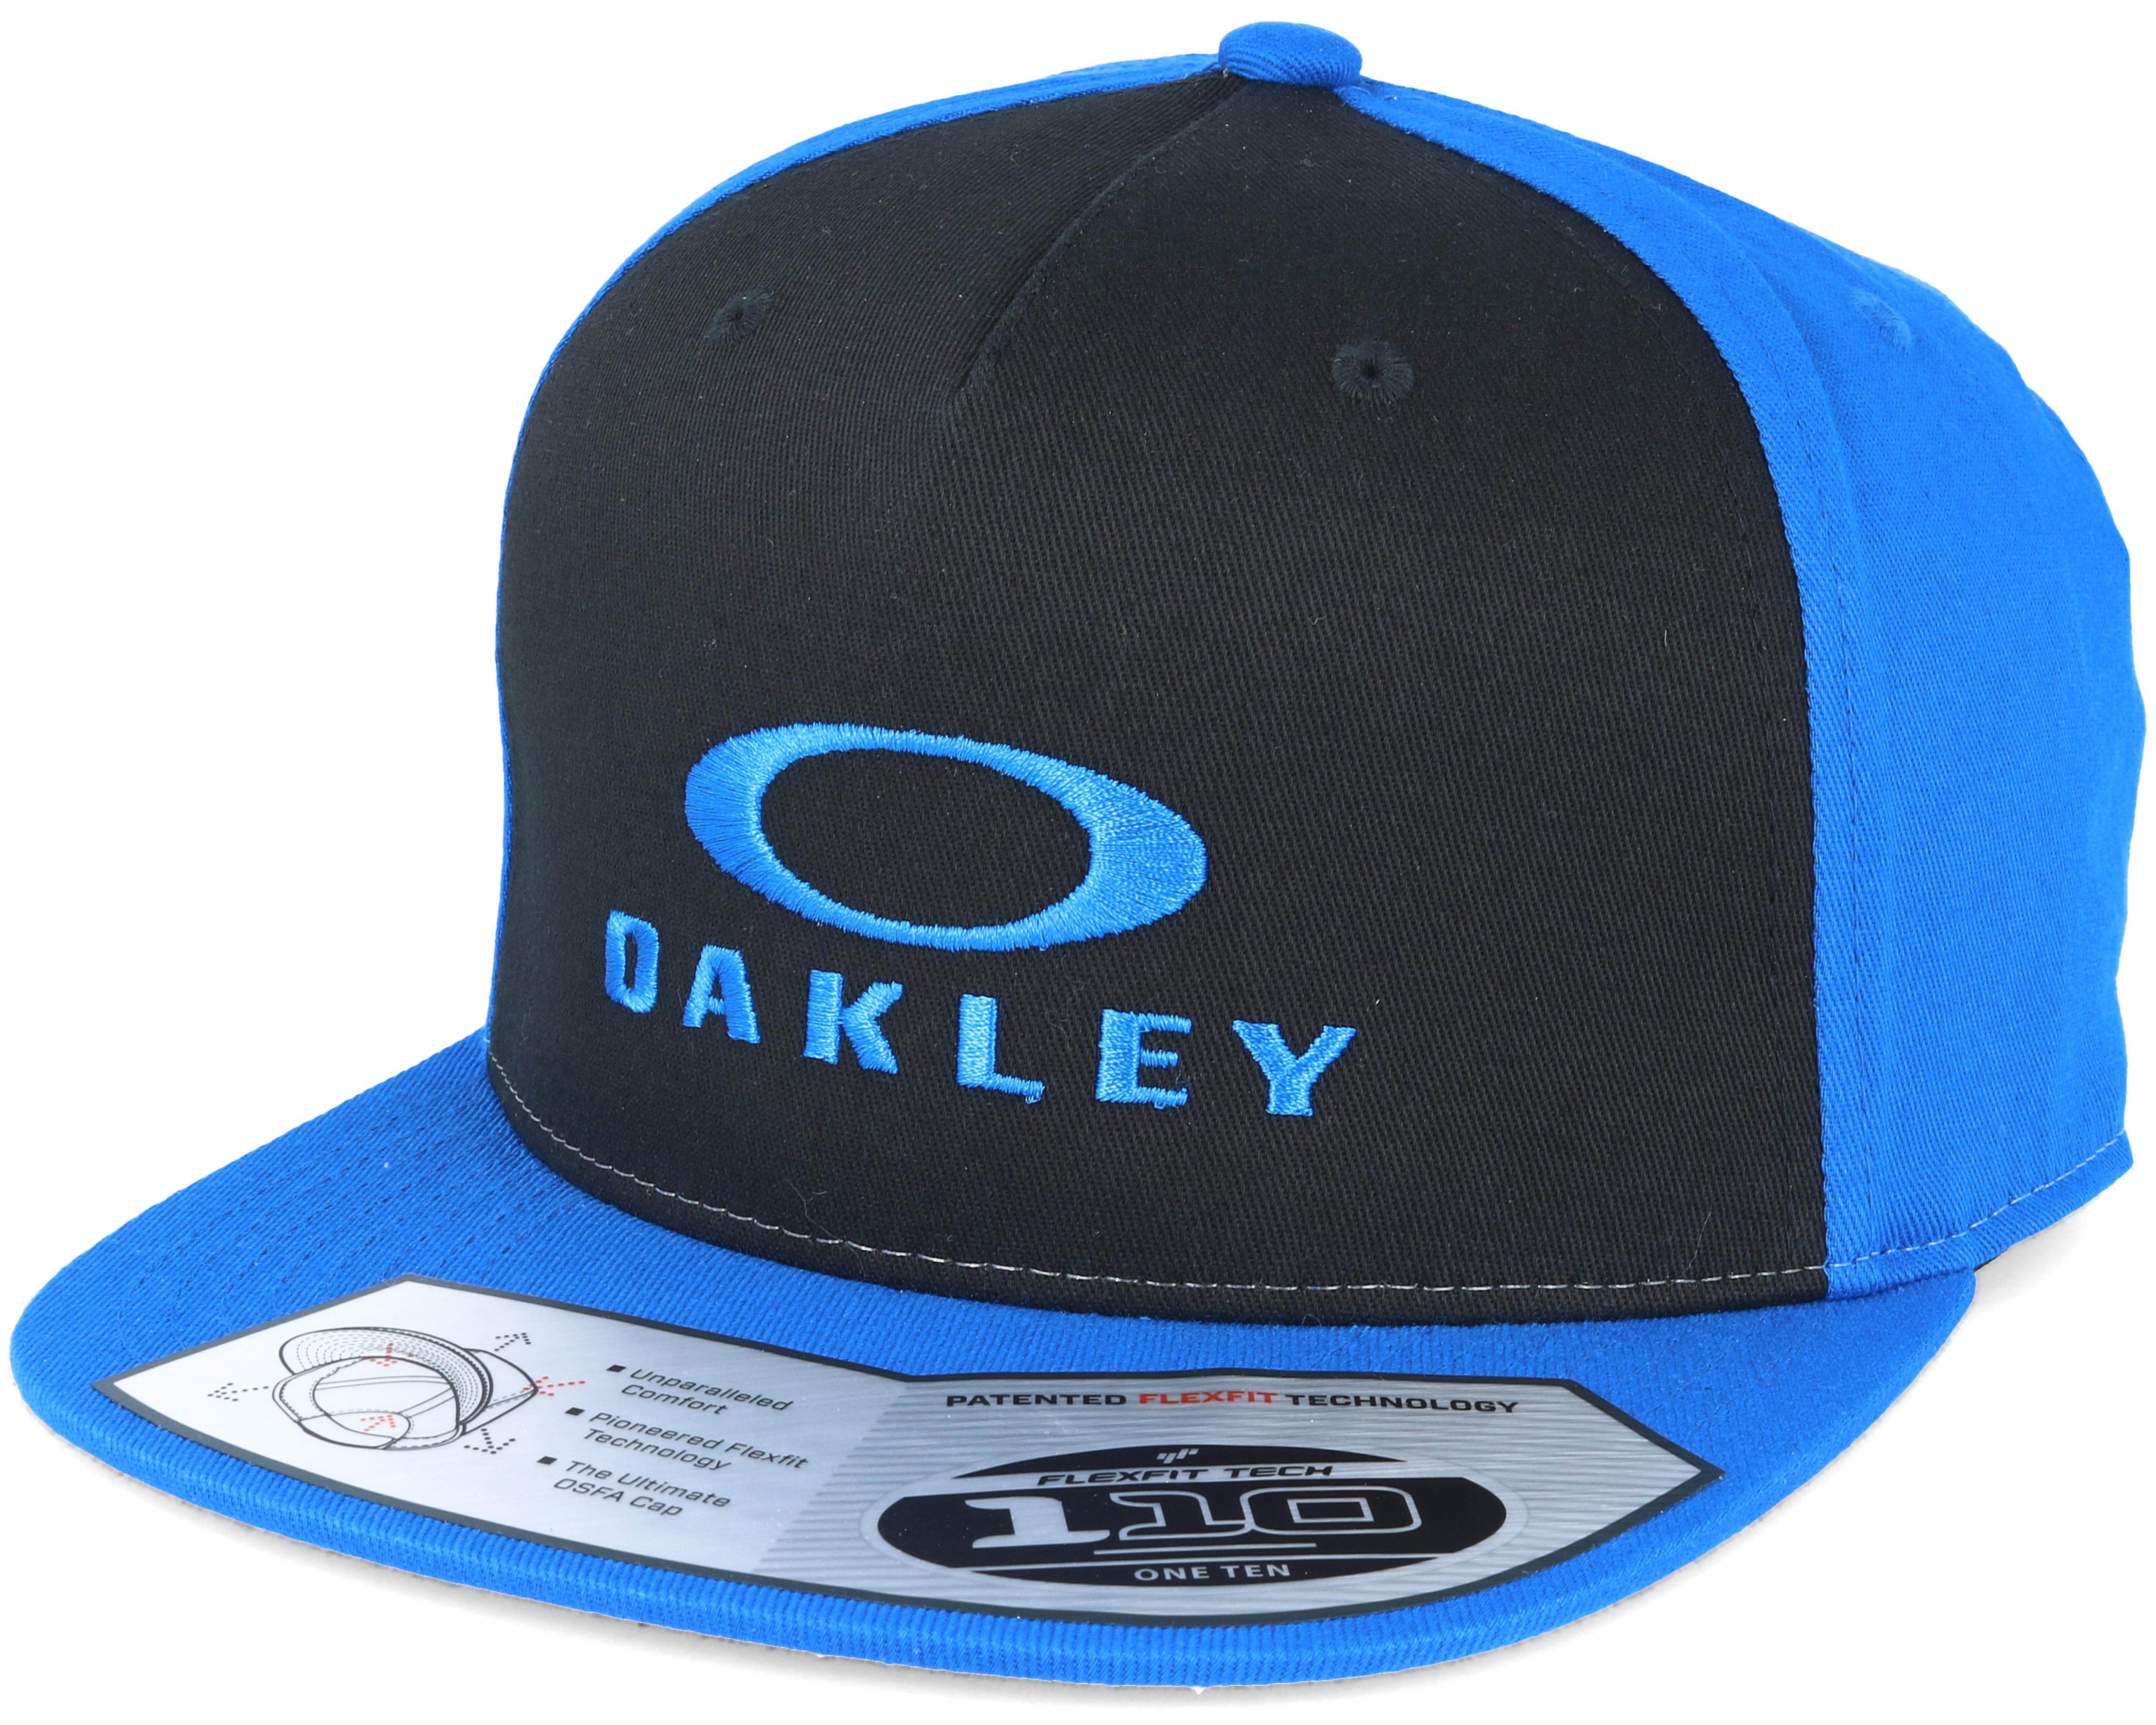 8933c93db68ee wholesale oakley perf hat e39fc 97de9  good sliver 110 flexfit black blue snapback  oakley 50cd0 abfd3